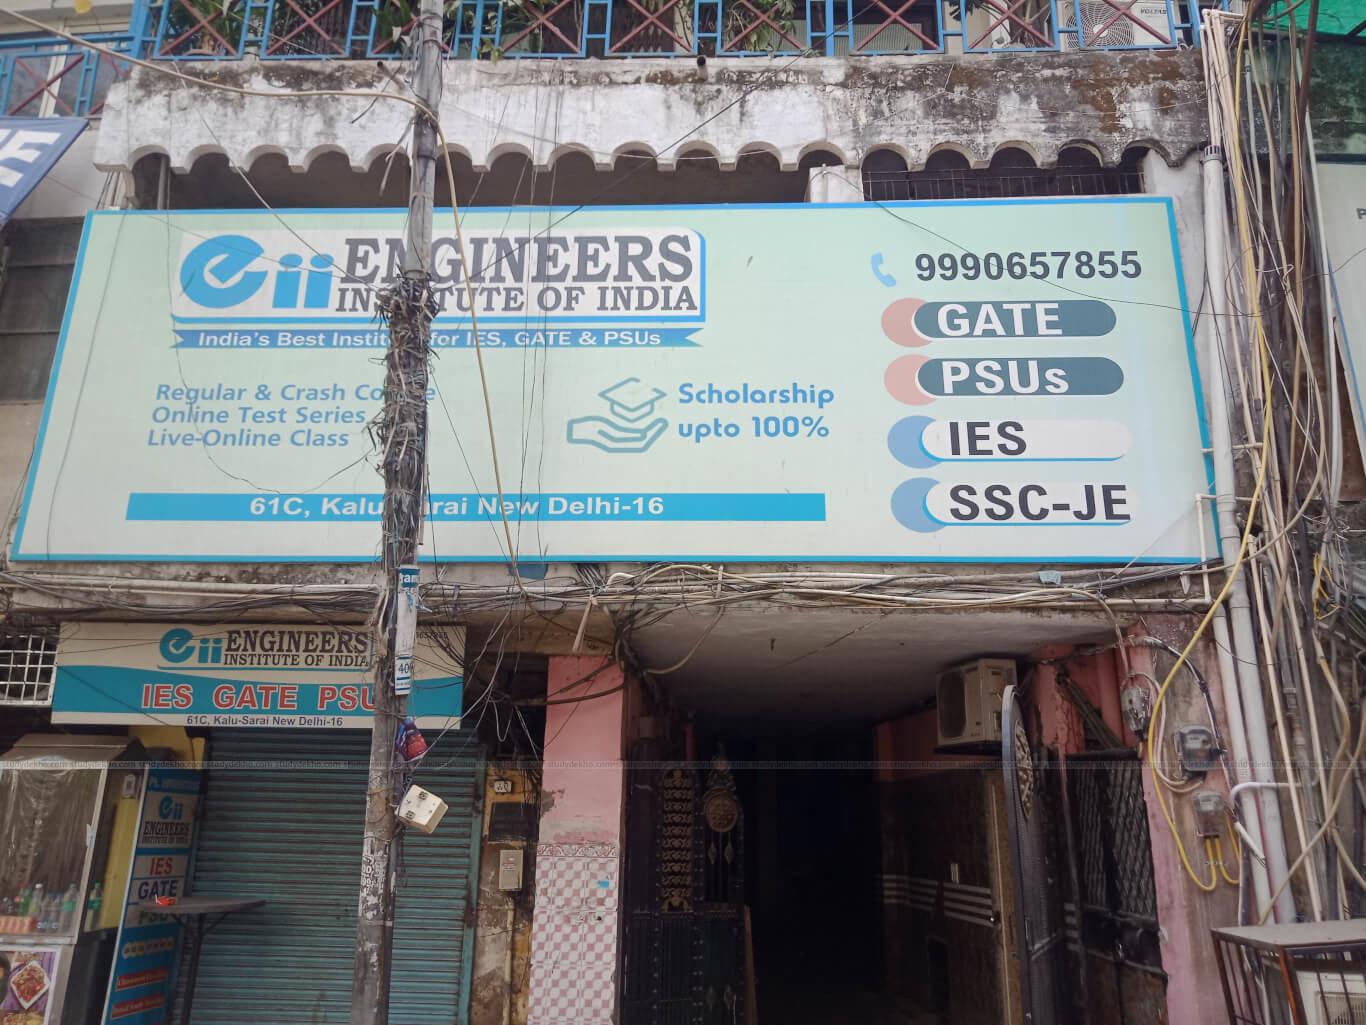 Engineers Institute Of India Gallery